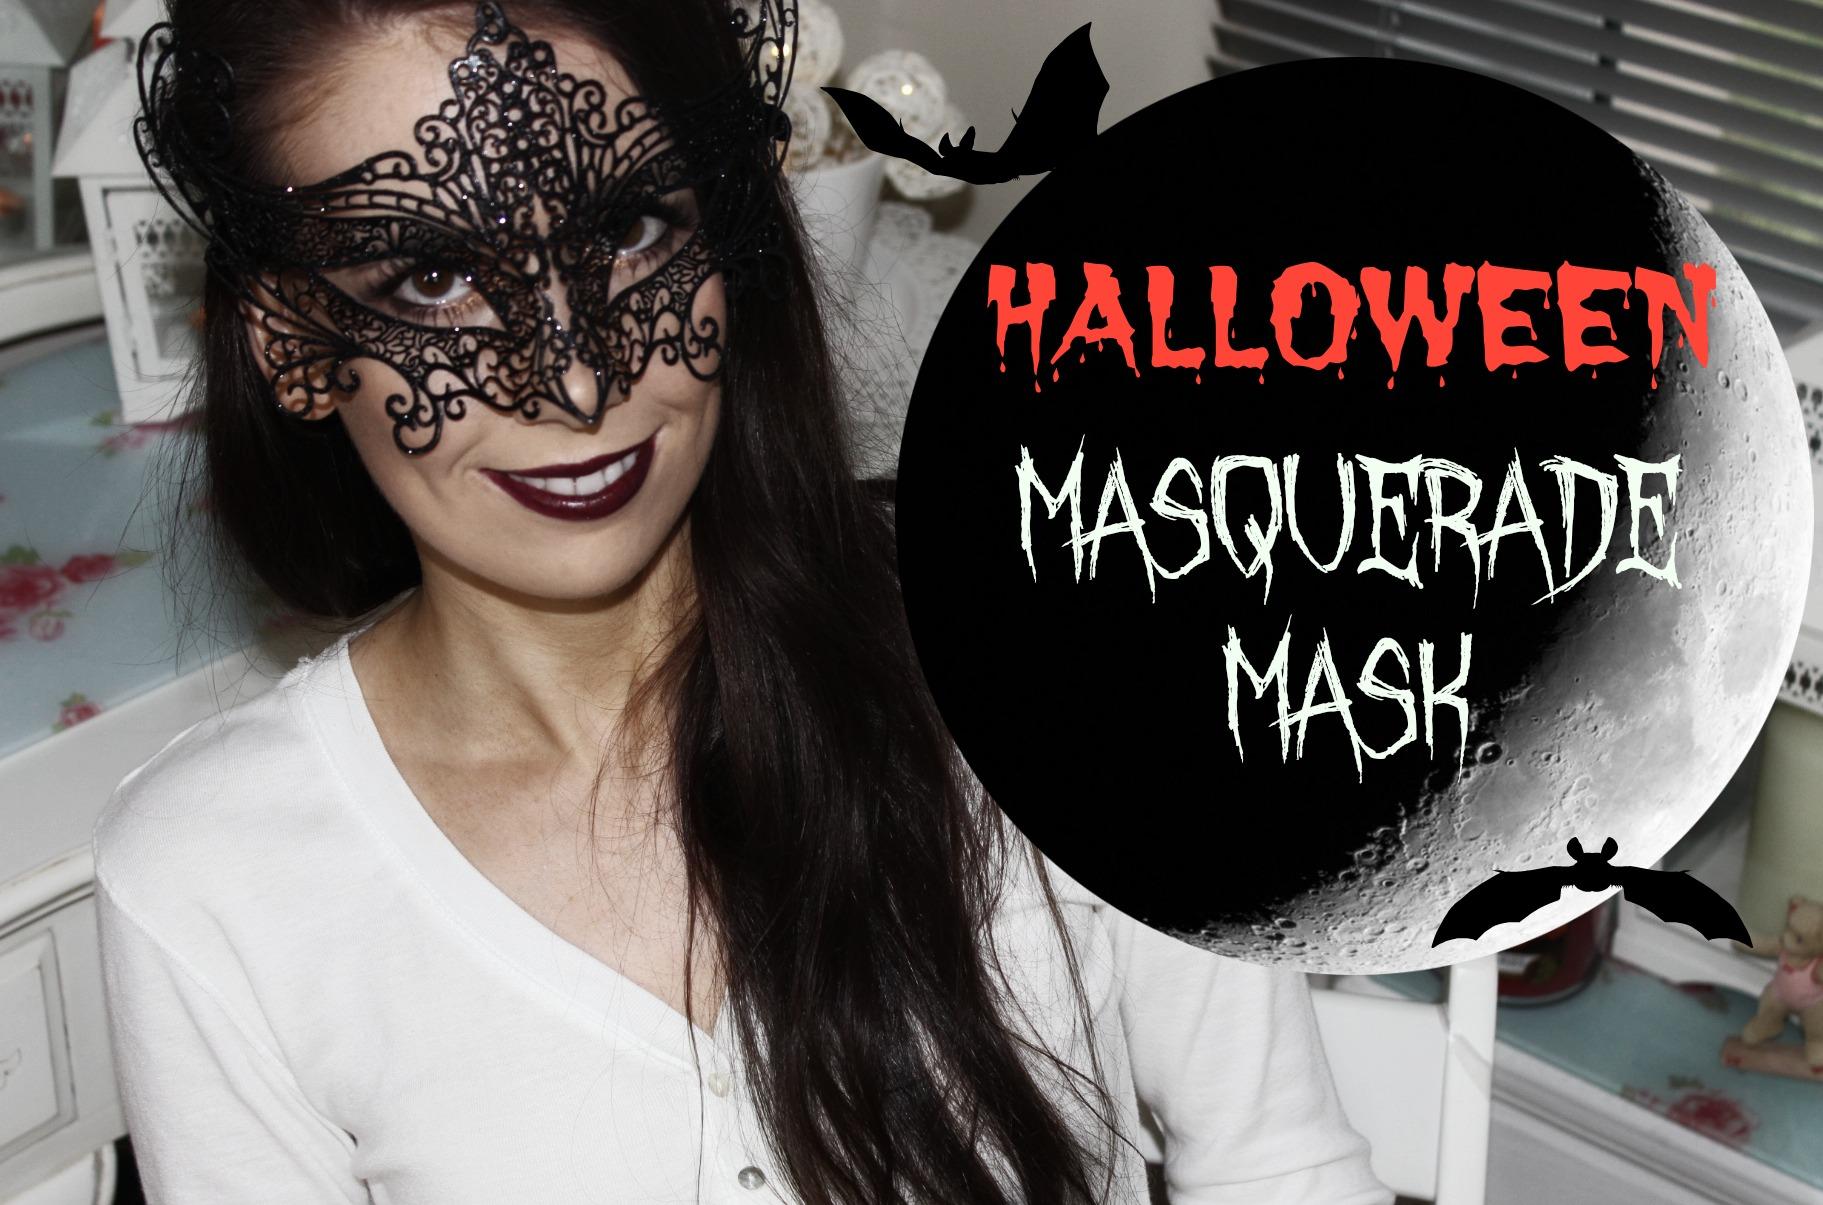 MASQUERADE MASK HALLOWEEN MAKEUP TUTORIAL - The Girl In The Tartan ...